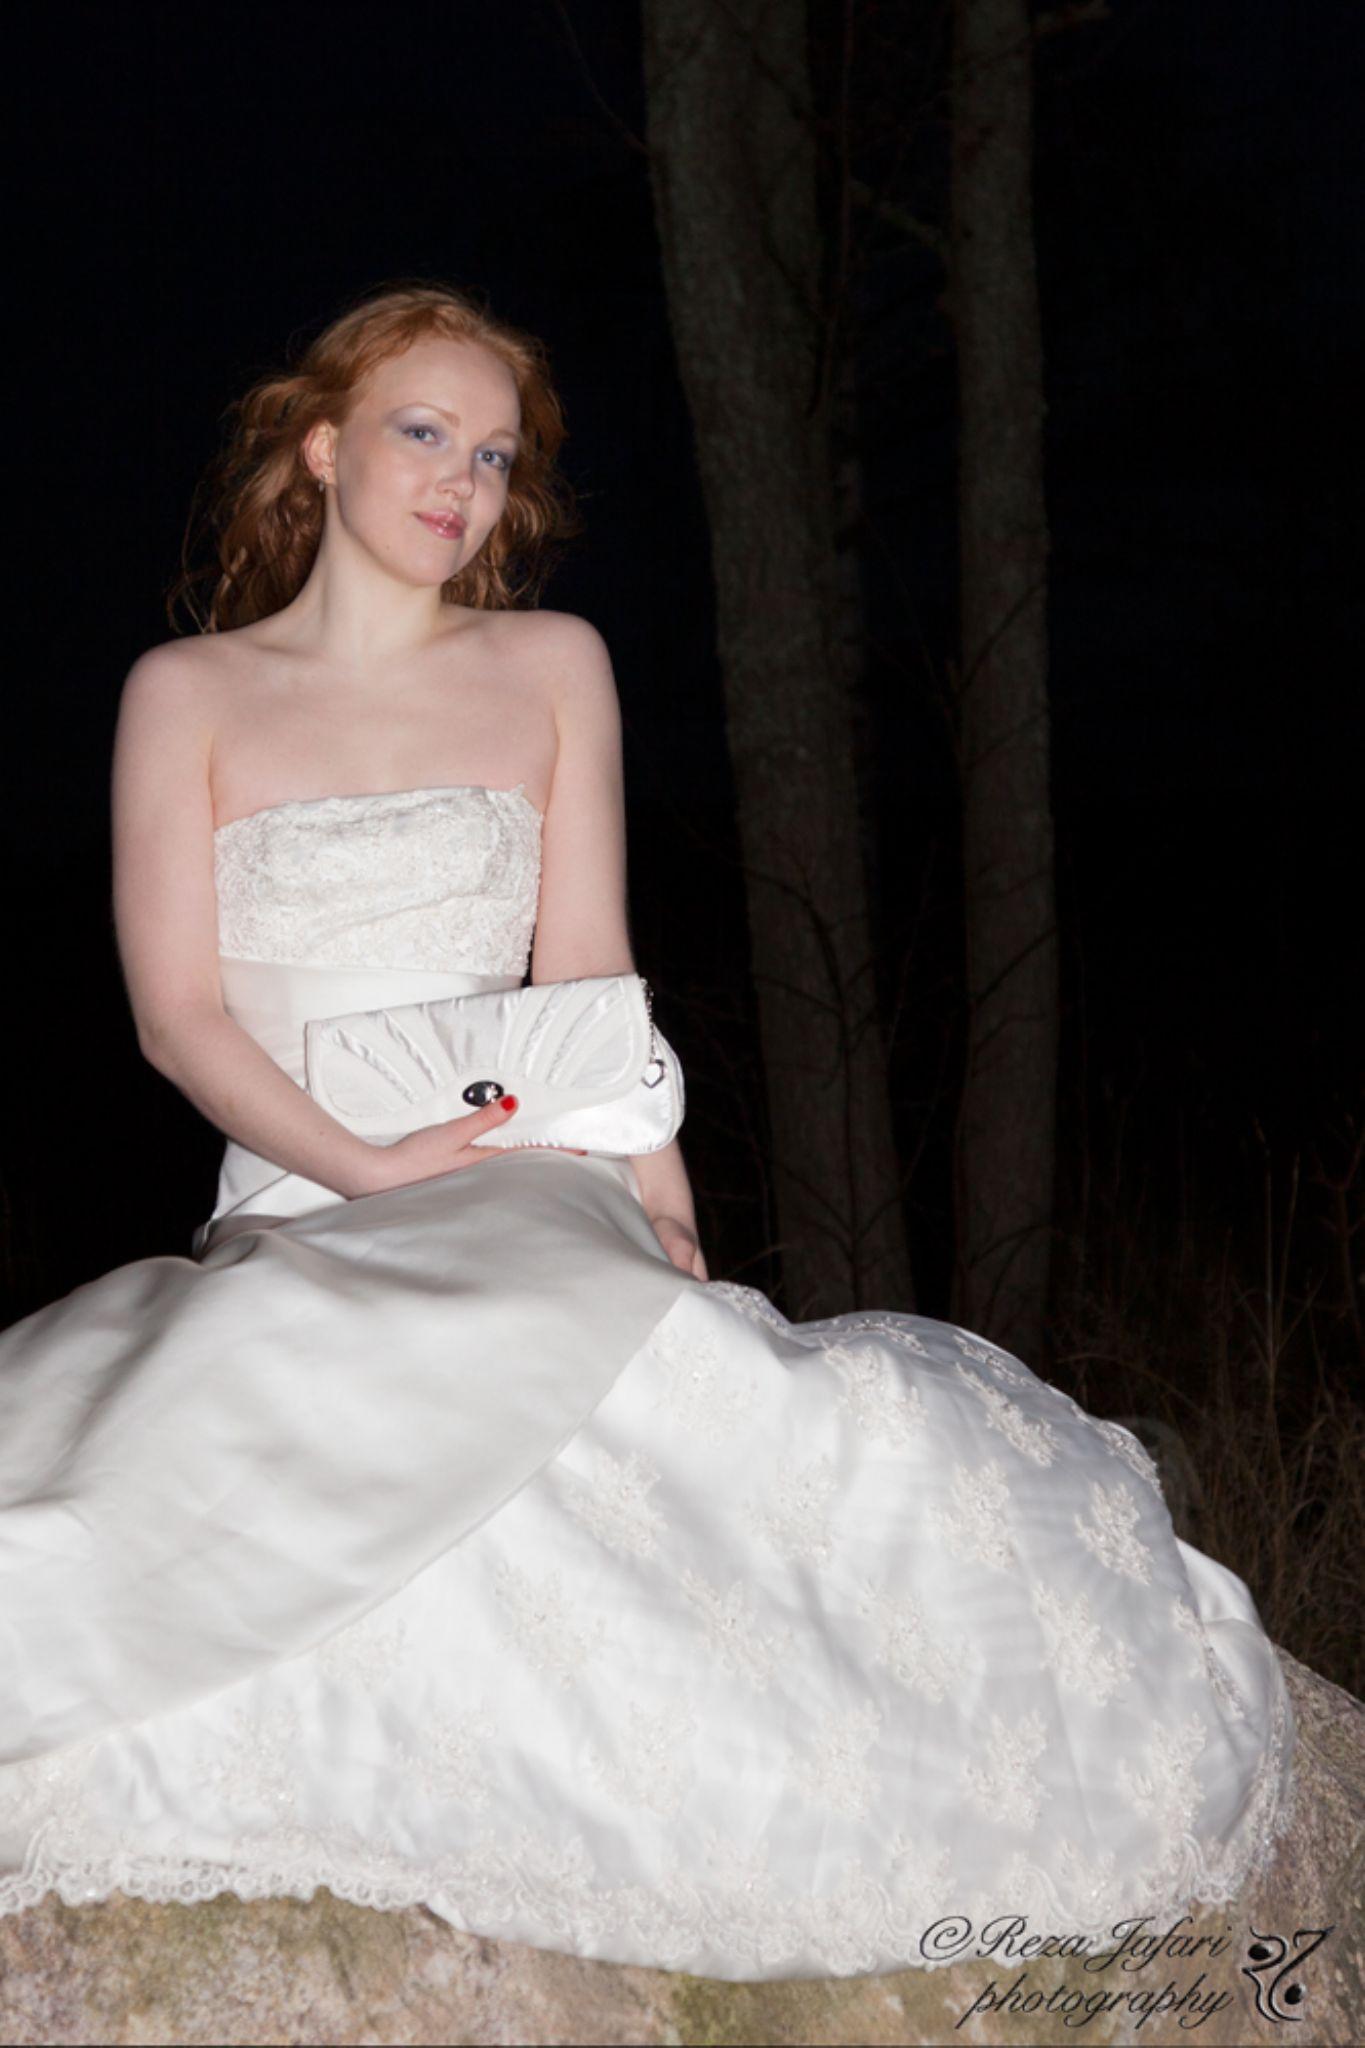 White bride dress by ArianJafari